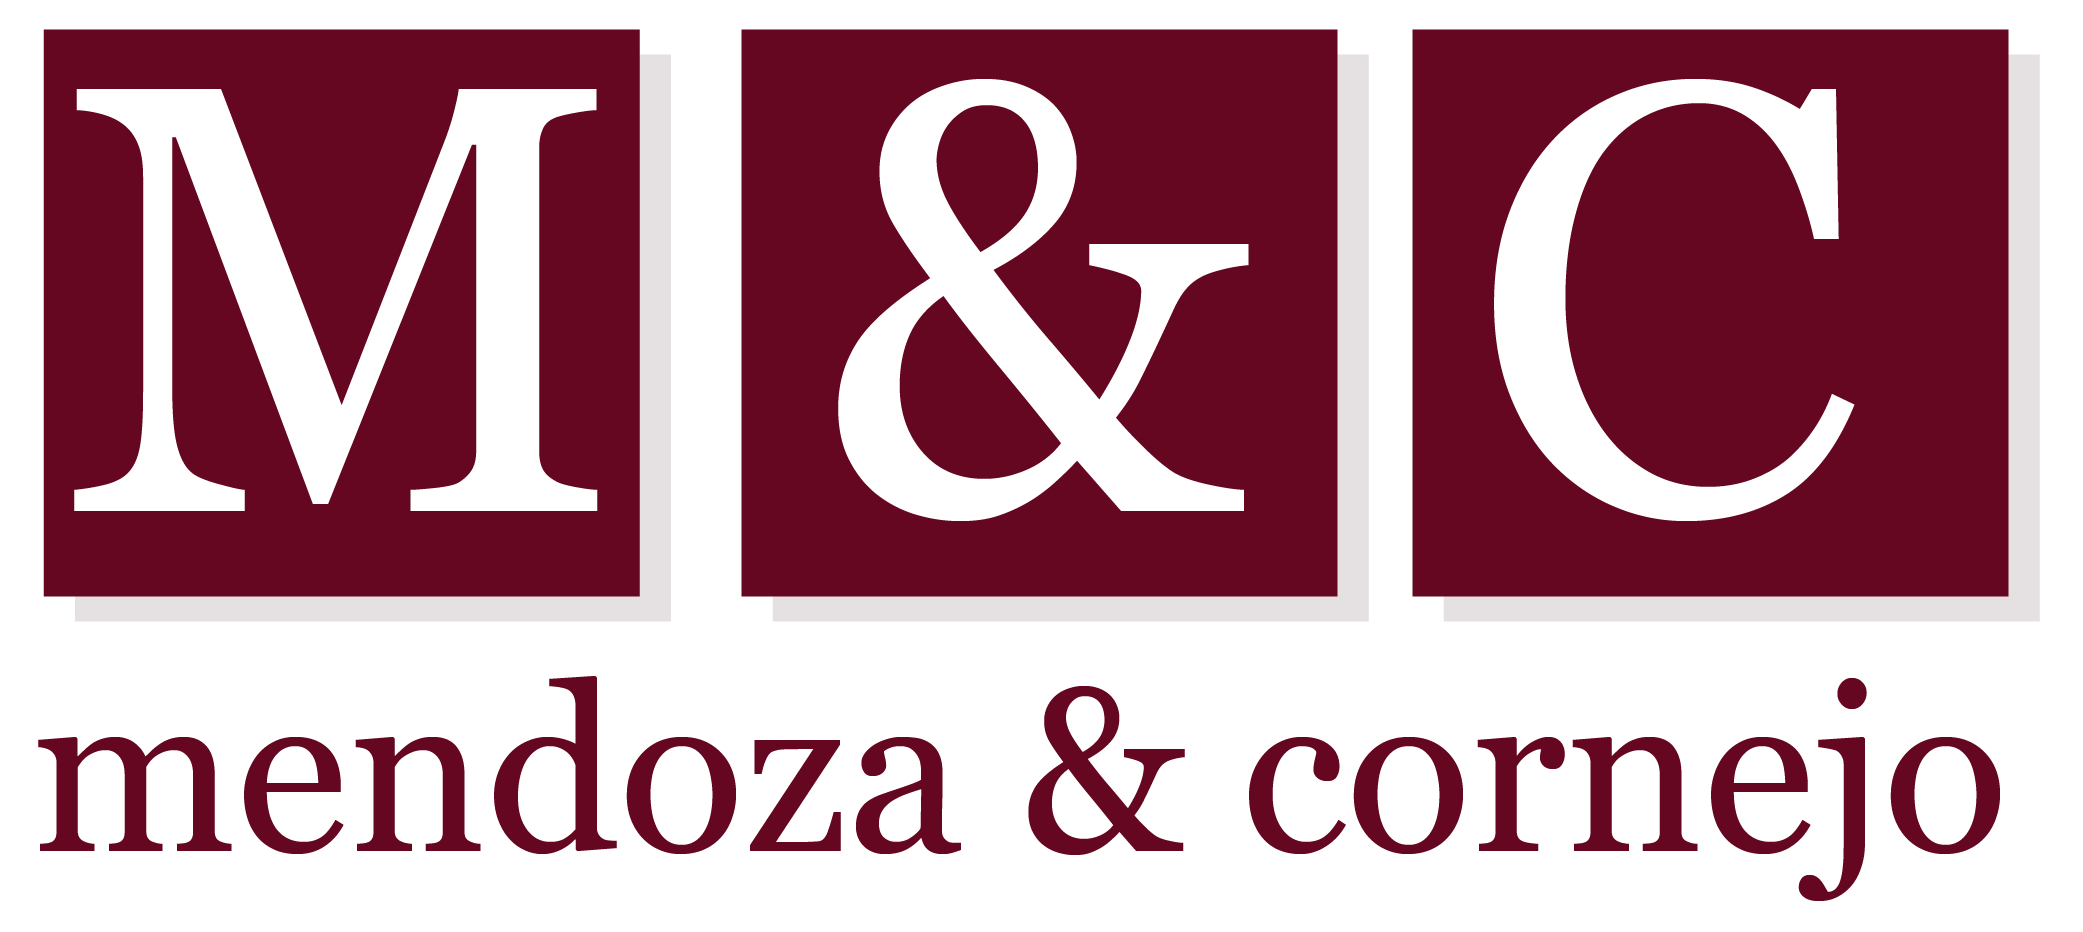 Mendoza & Cornejo